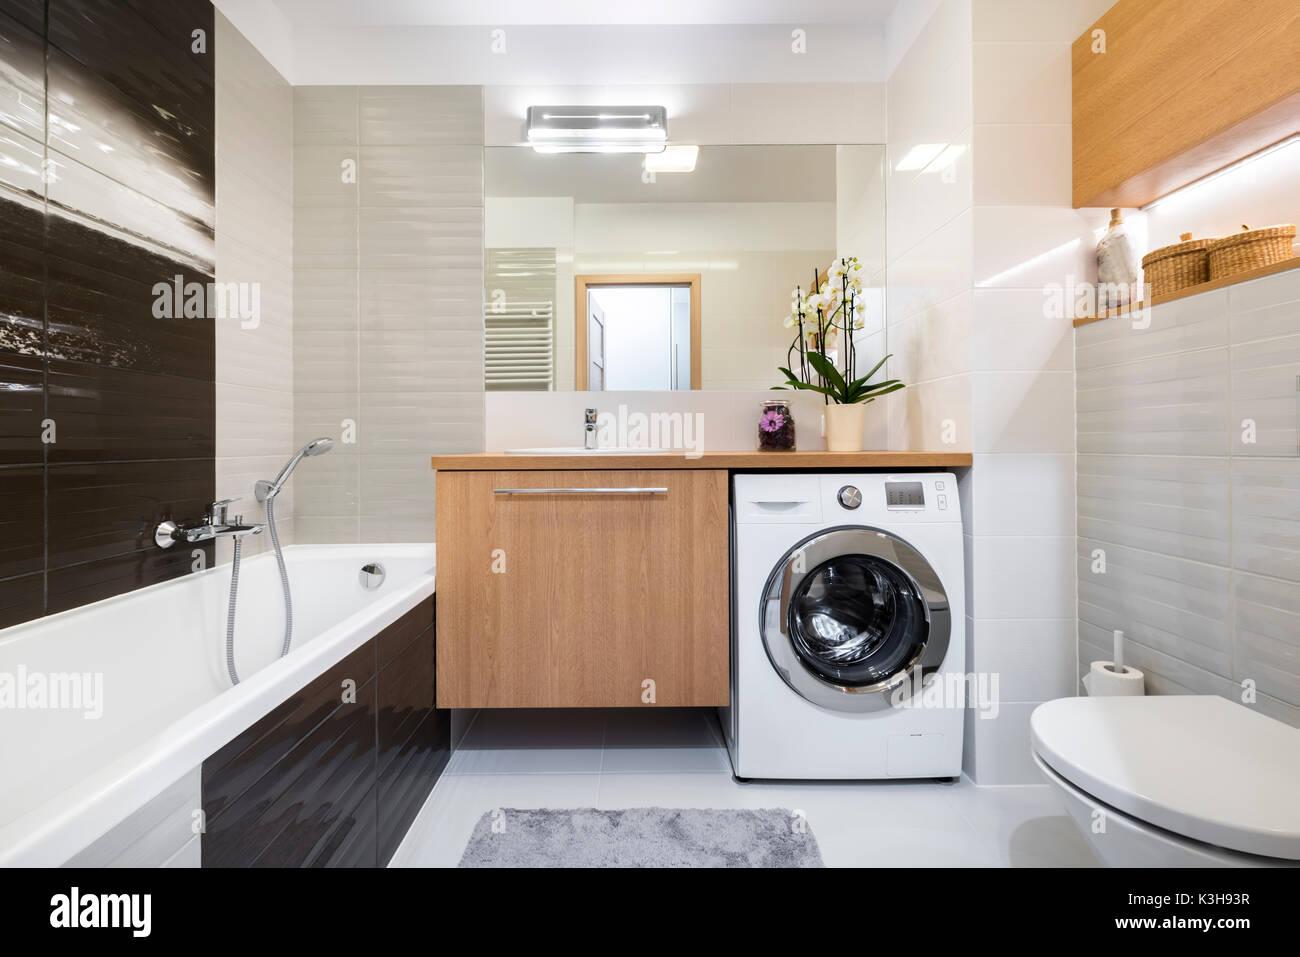 Modernes Badezimmer Innenausbau in Holz- und Grau Stockfoto ...